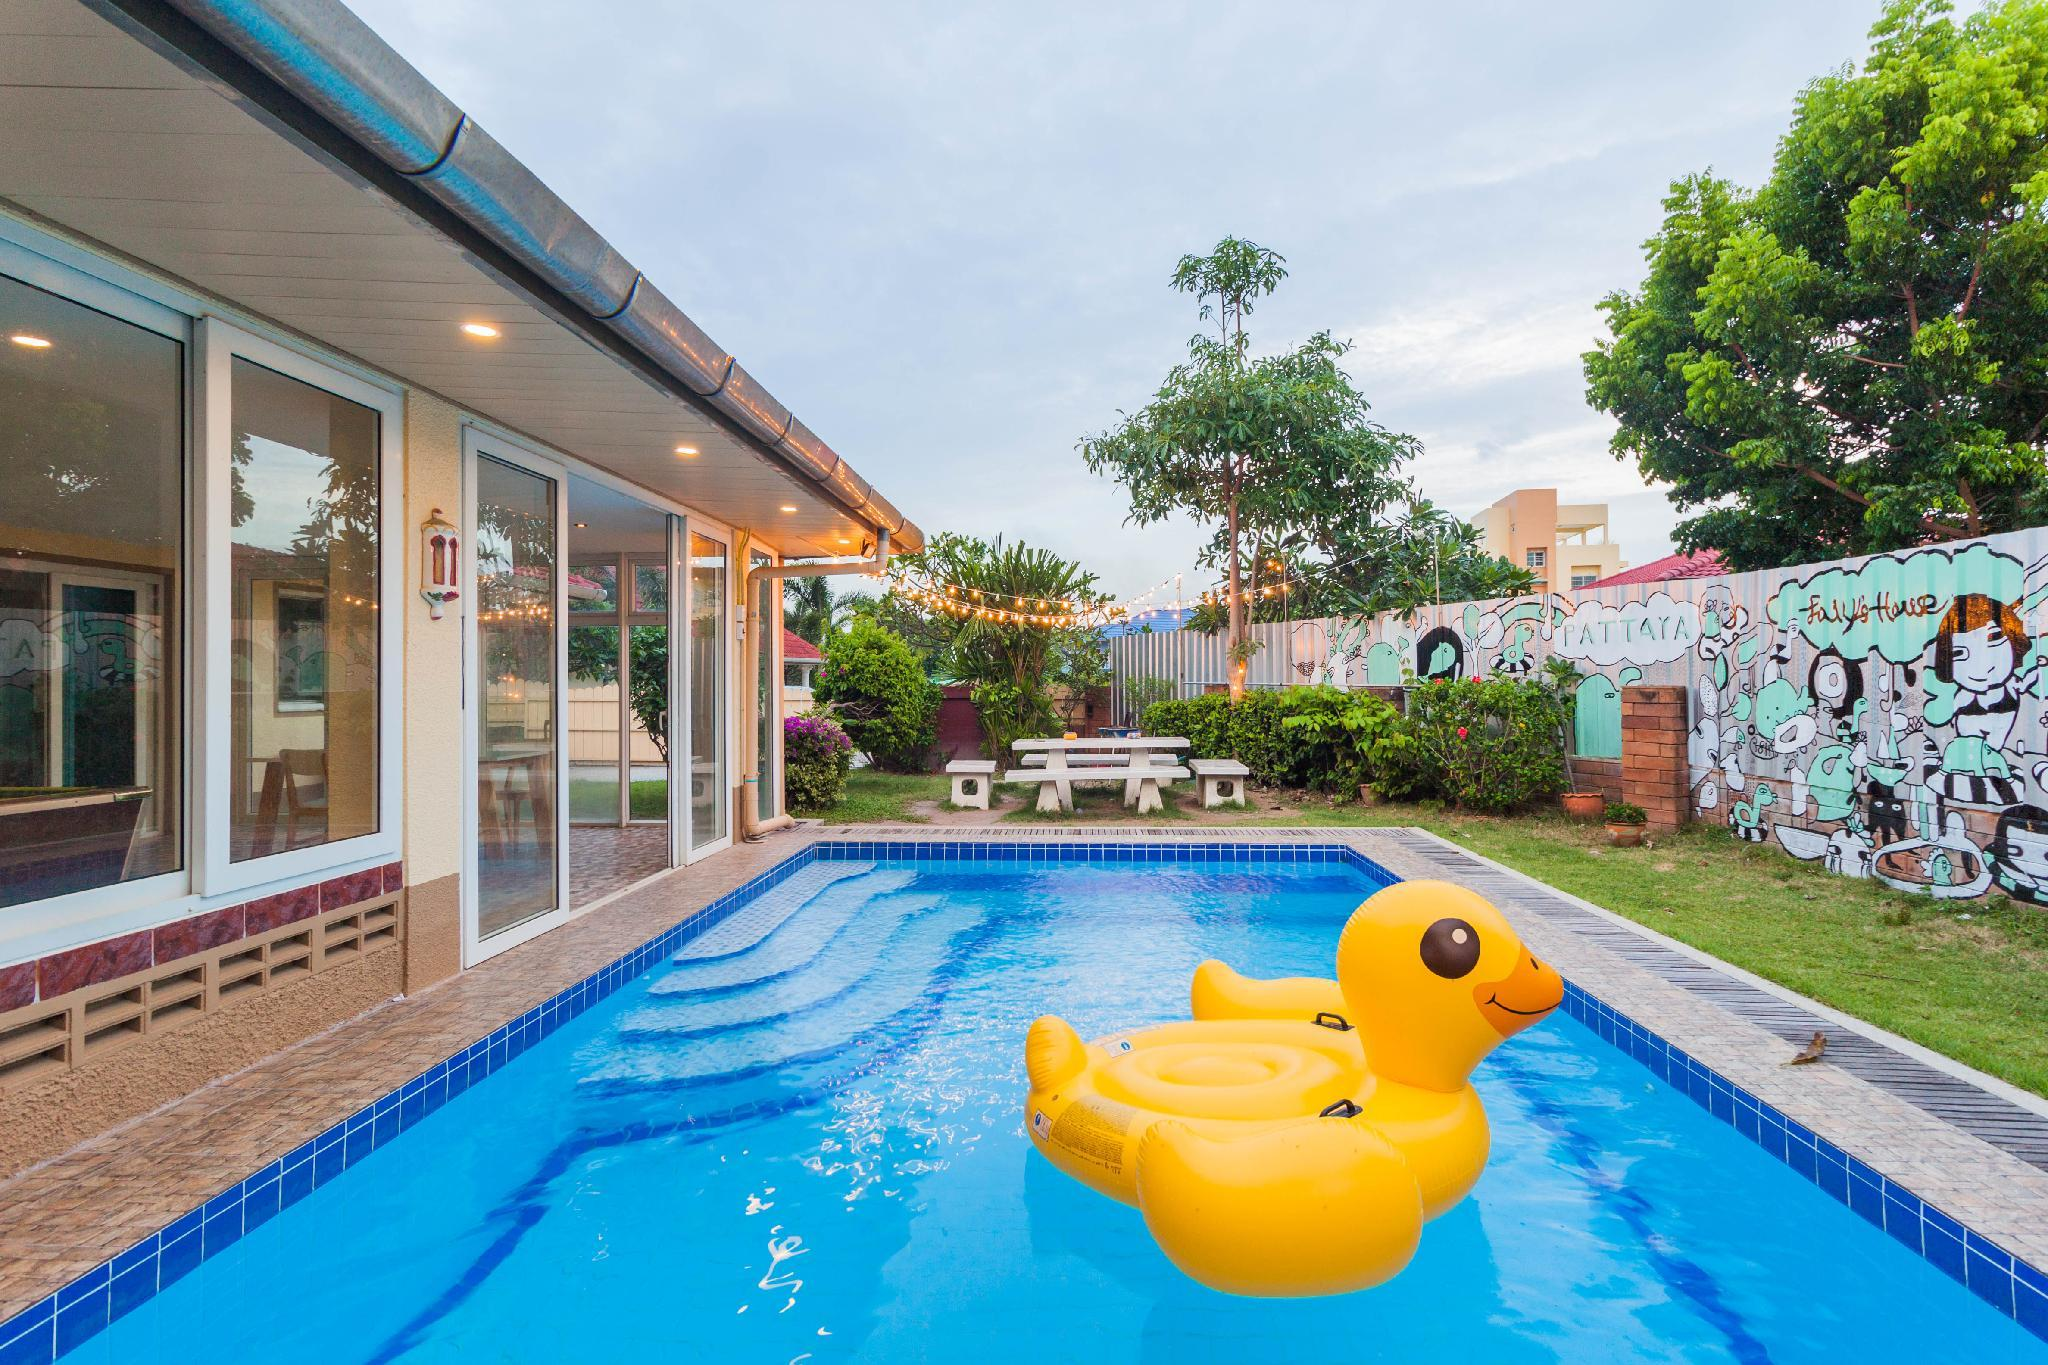 Fairy's House Pool Villa